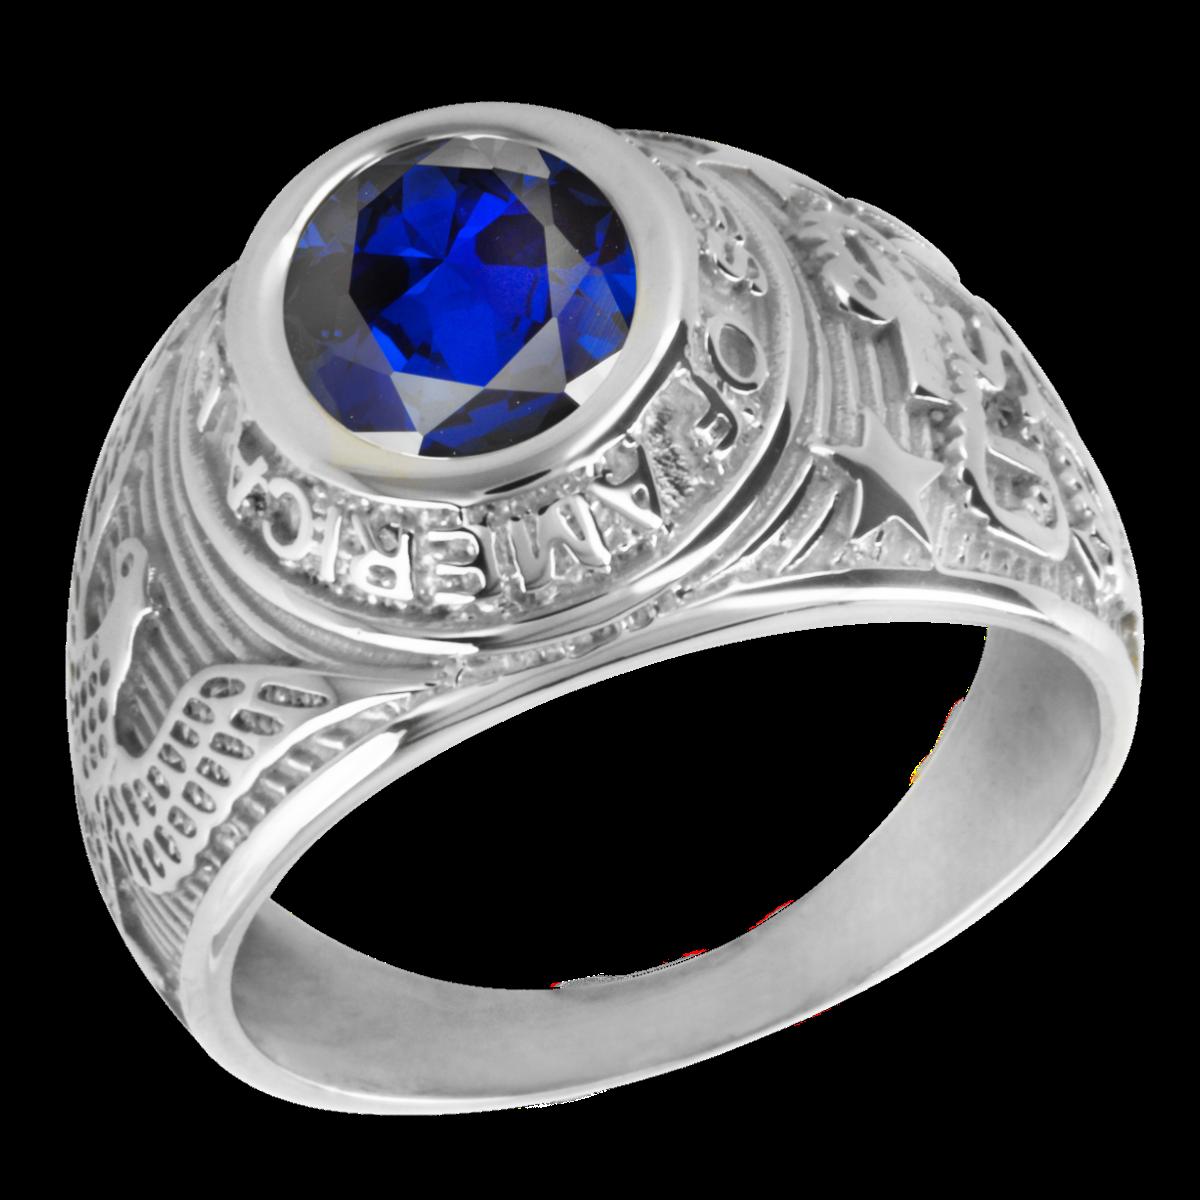 bague en argent avec saphir bleu